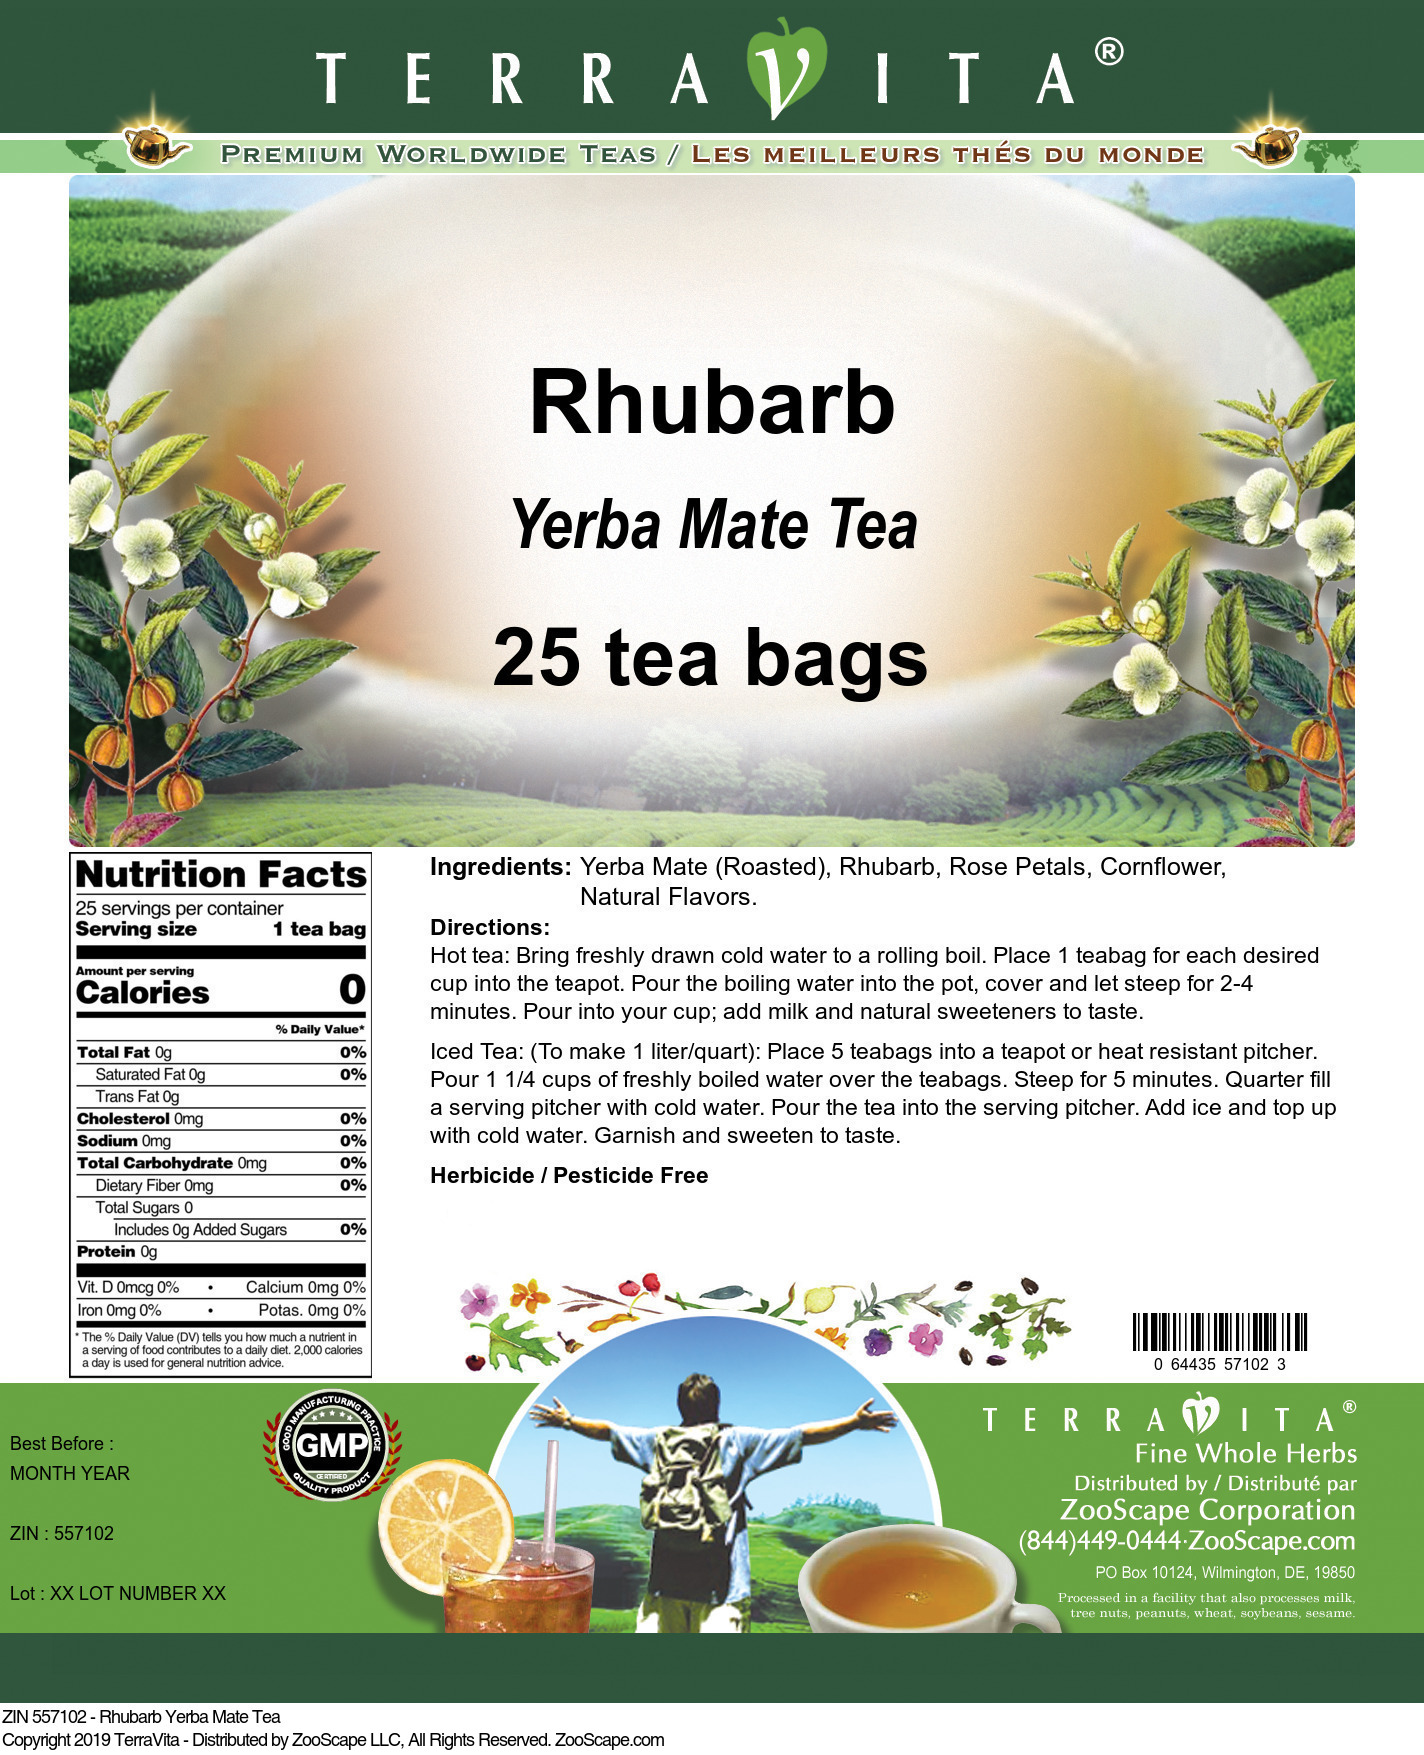 Rhubarb Yerba Mate Tea